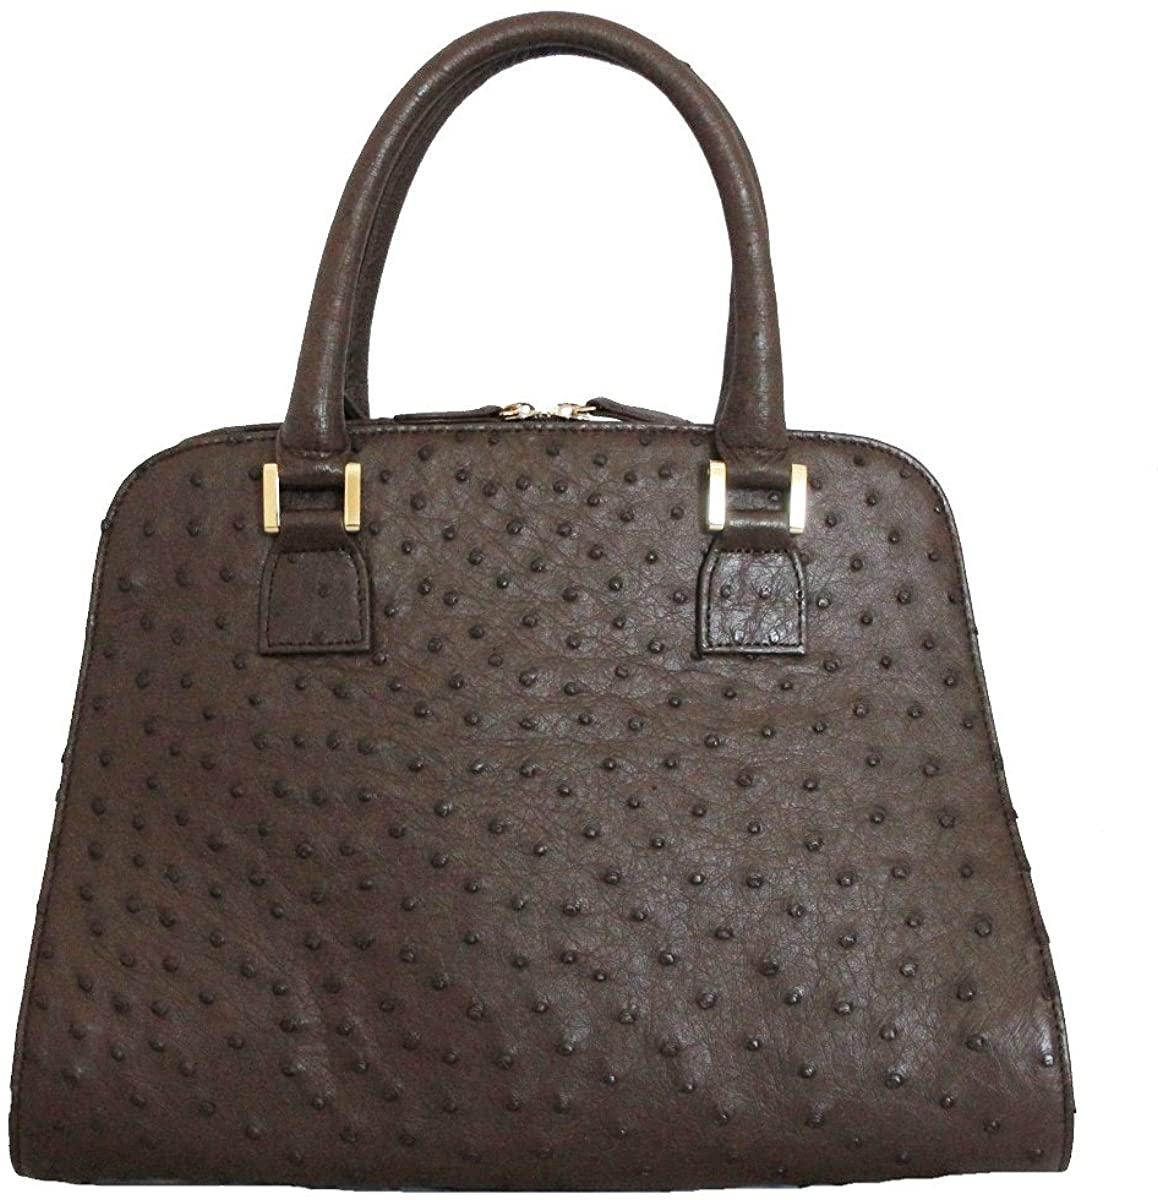 FIORI EO0030 Genuine Ostrich Leather Handbag.